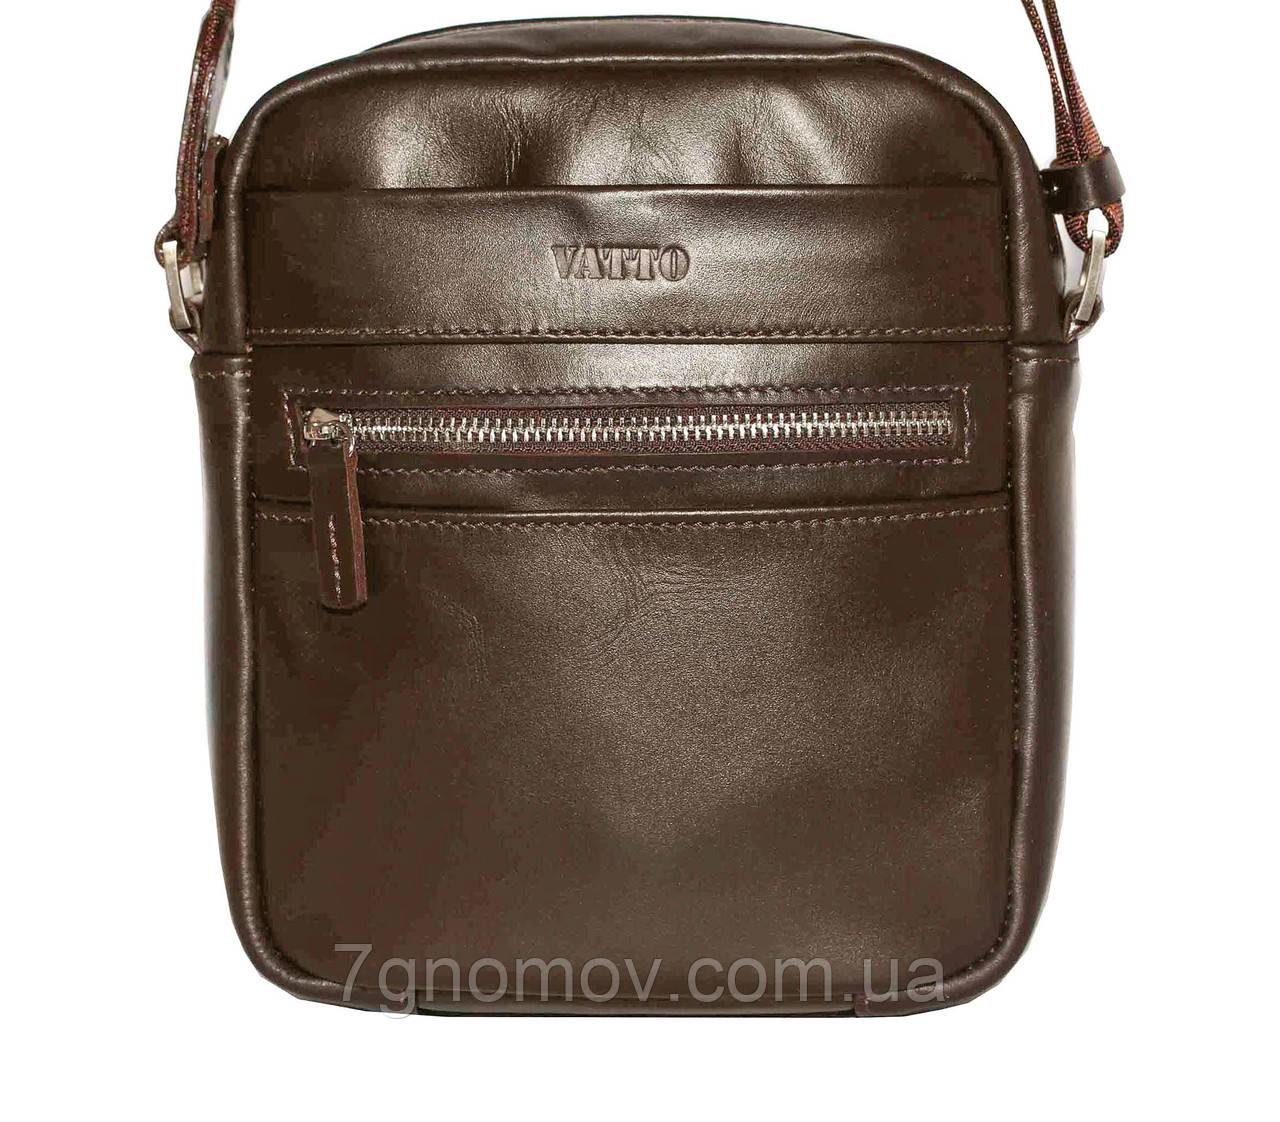 Мужская сумка VATTO Mk46 Kaz400